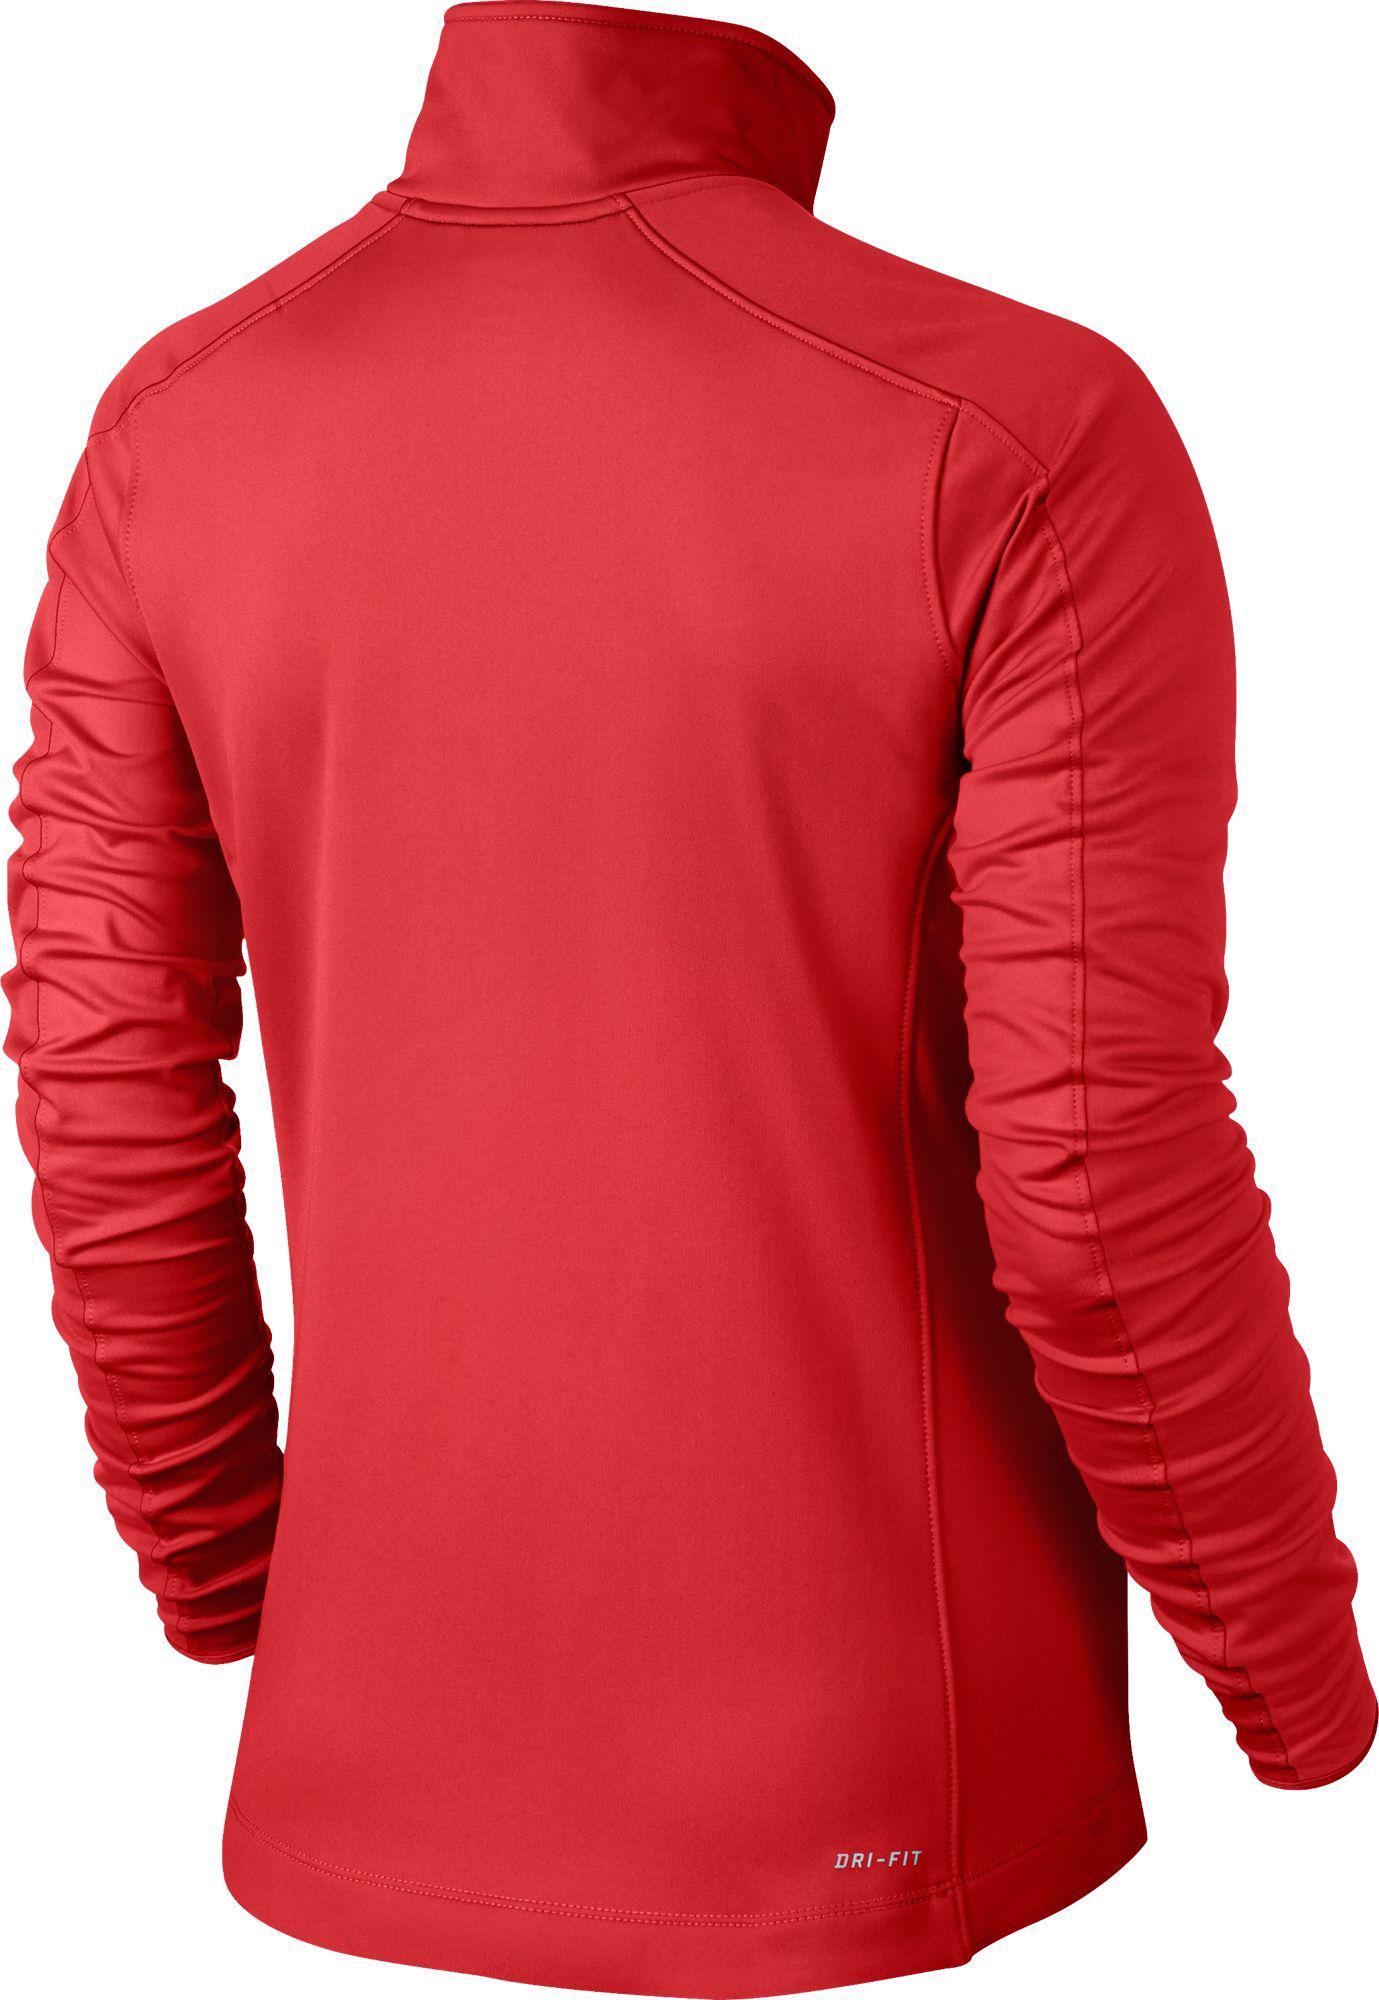 99e2ae13e Nike Red Dri-fit Thermal Full Zip Running Jacket